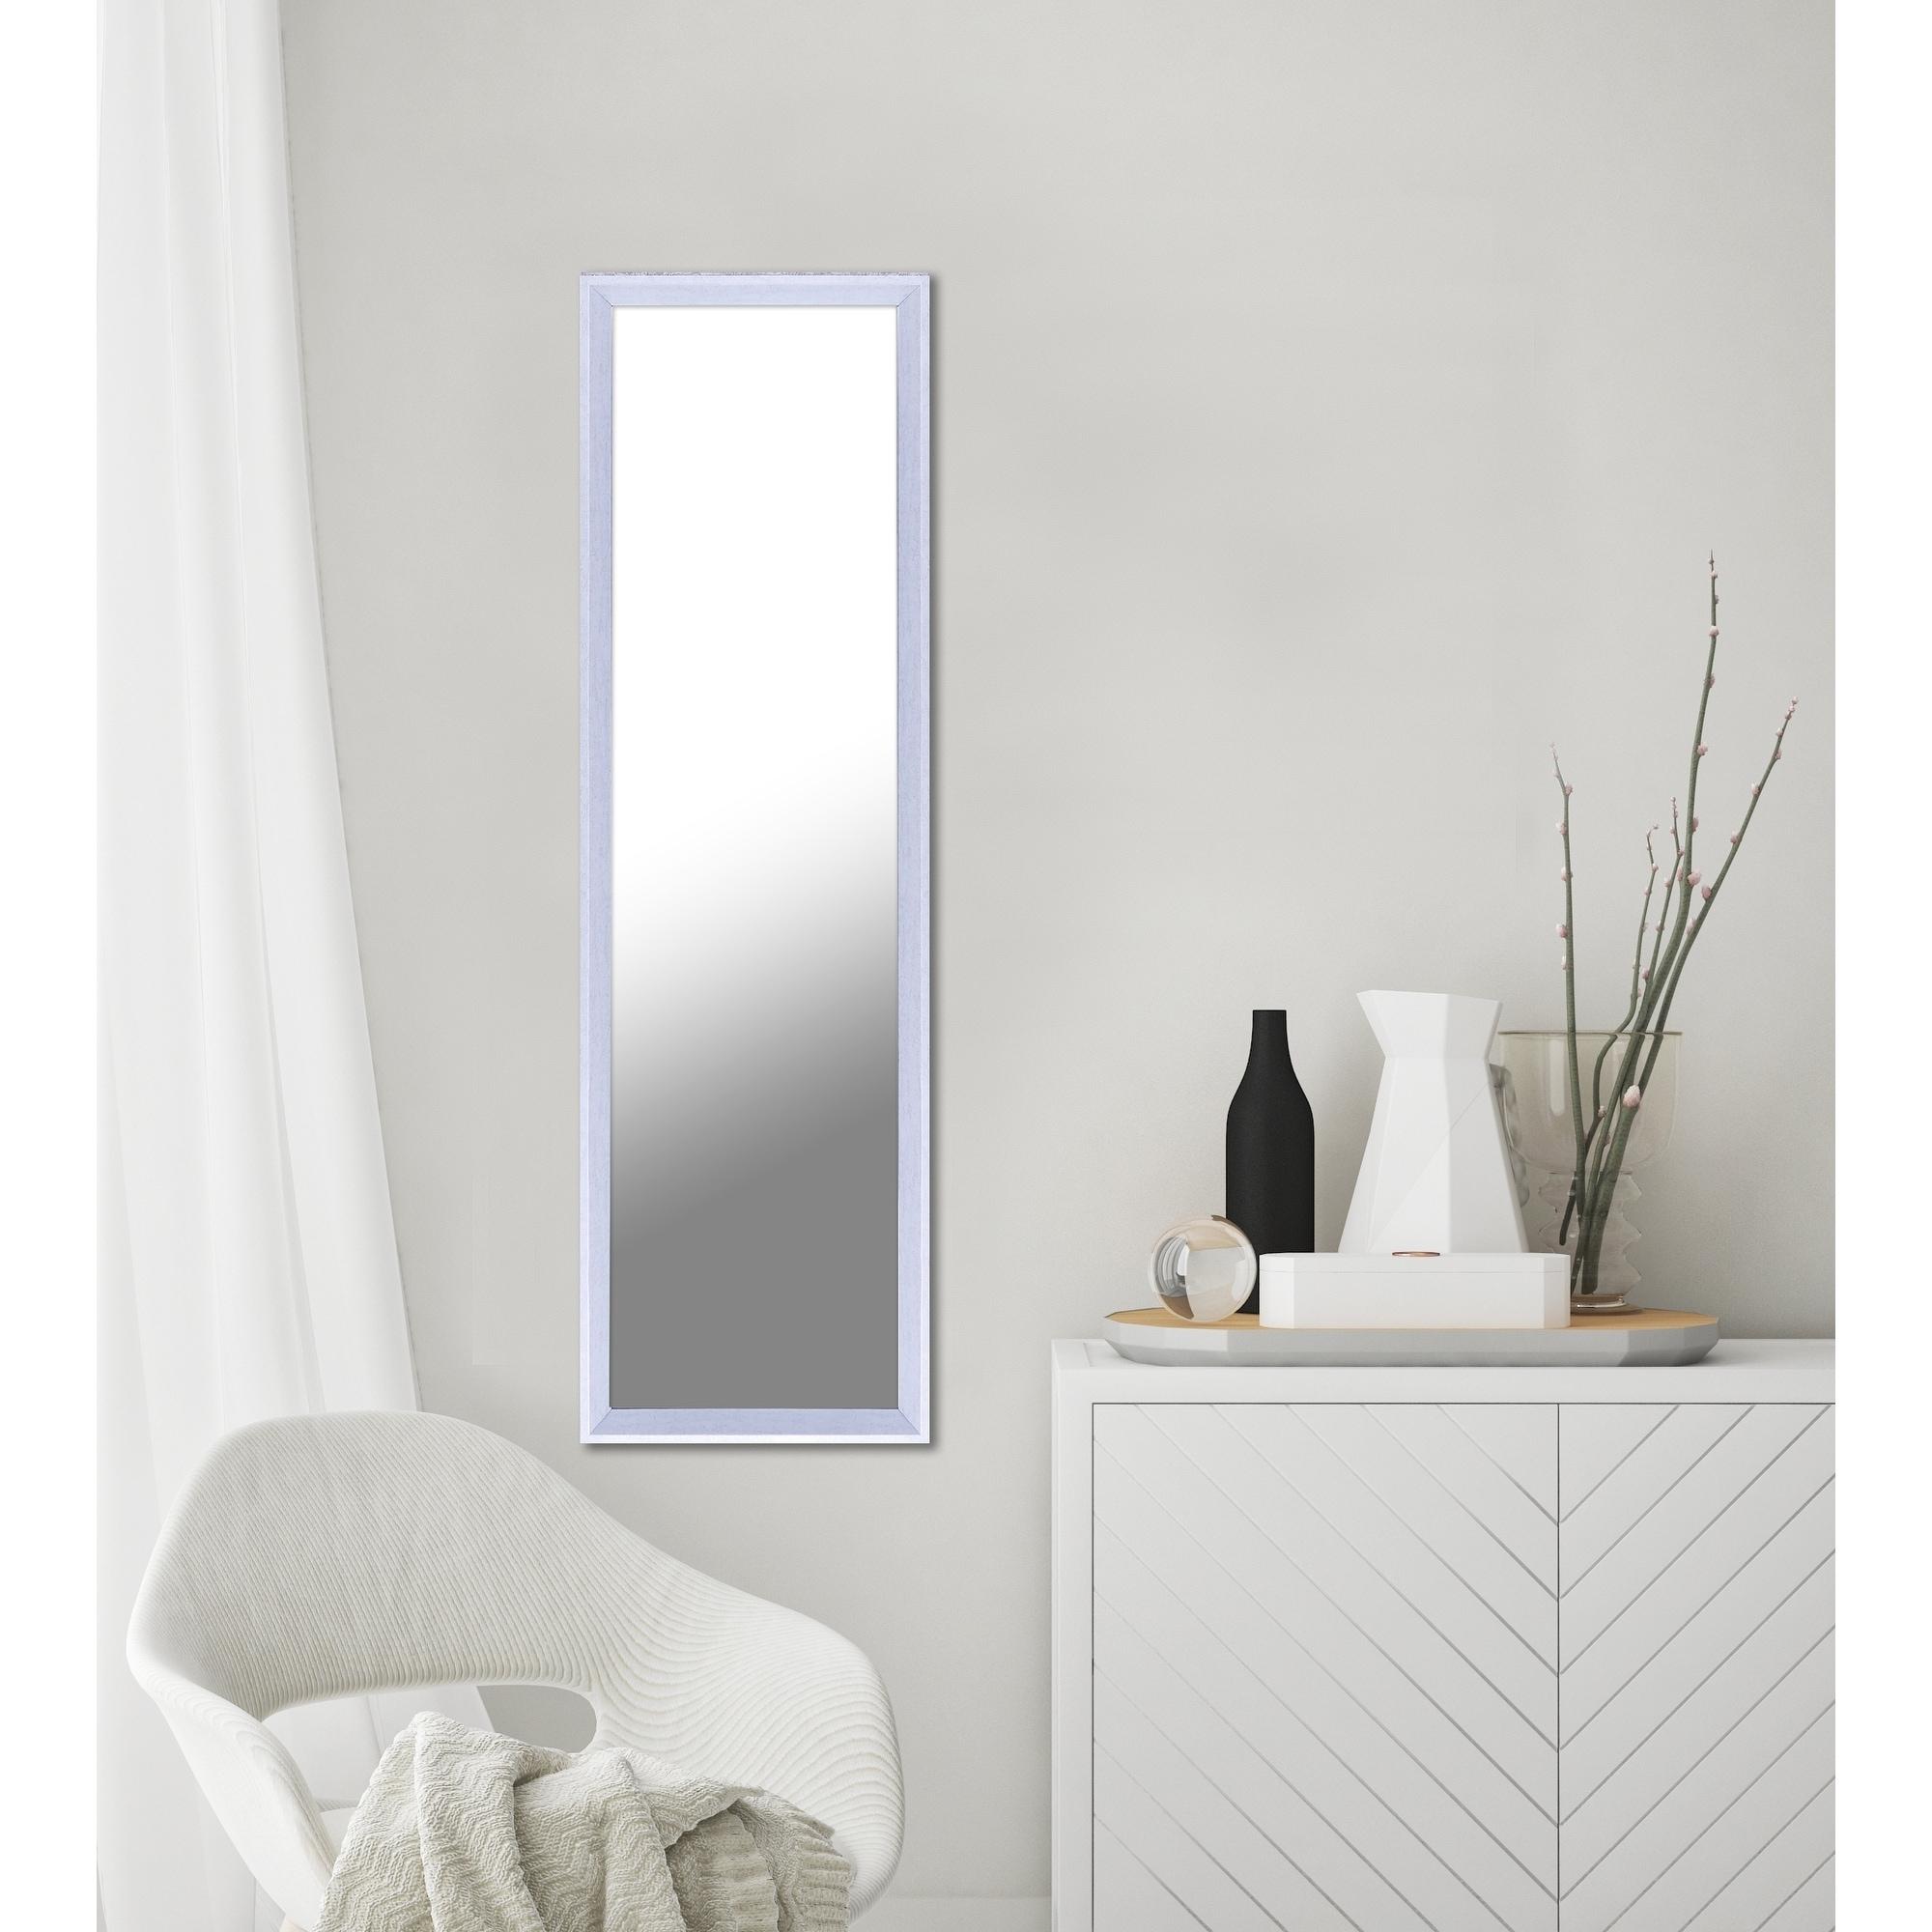 13 5x49 5 White Plastic Door And Wall Mirror Full Length Vanity Hallway Bathroom Bedroom Rectangle Medium Home Decor Overstock 18193740